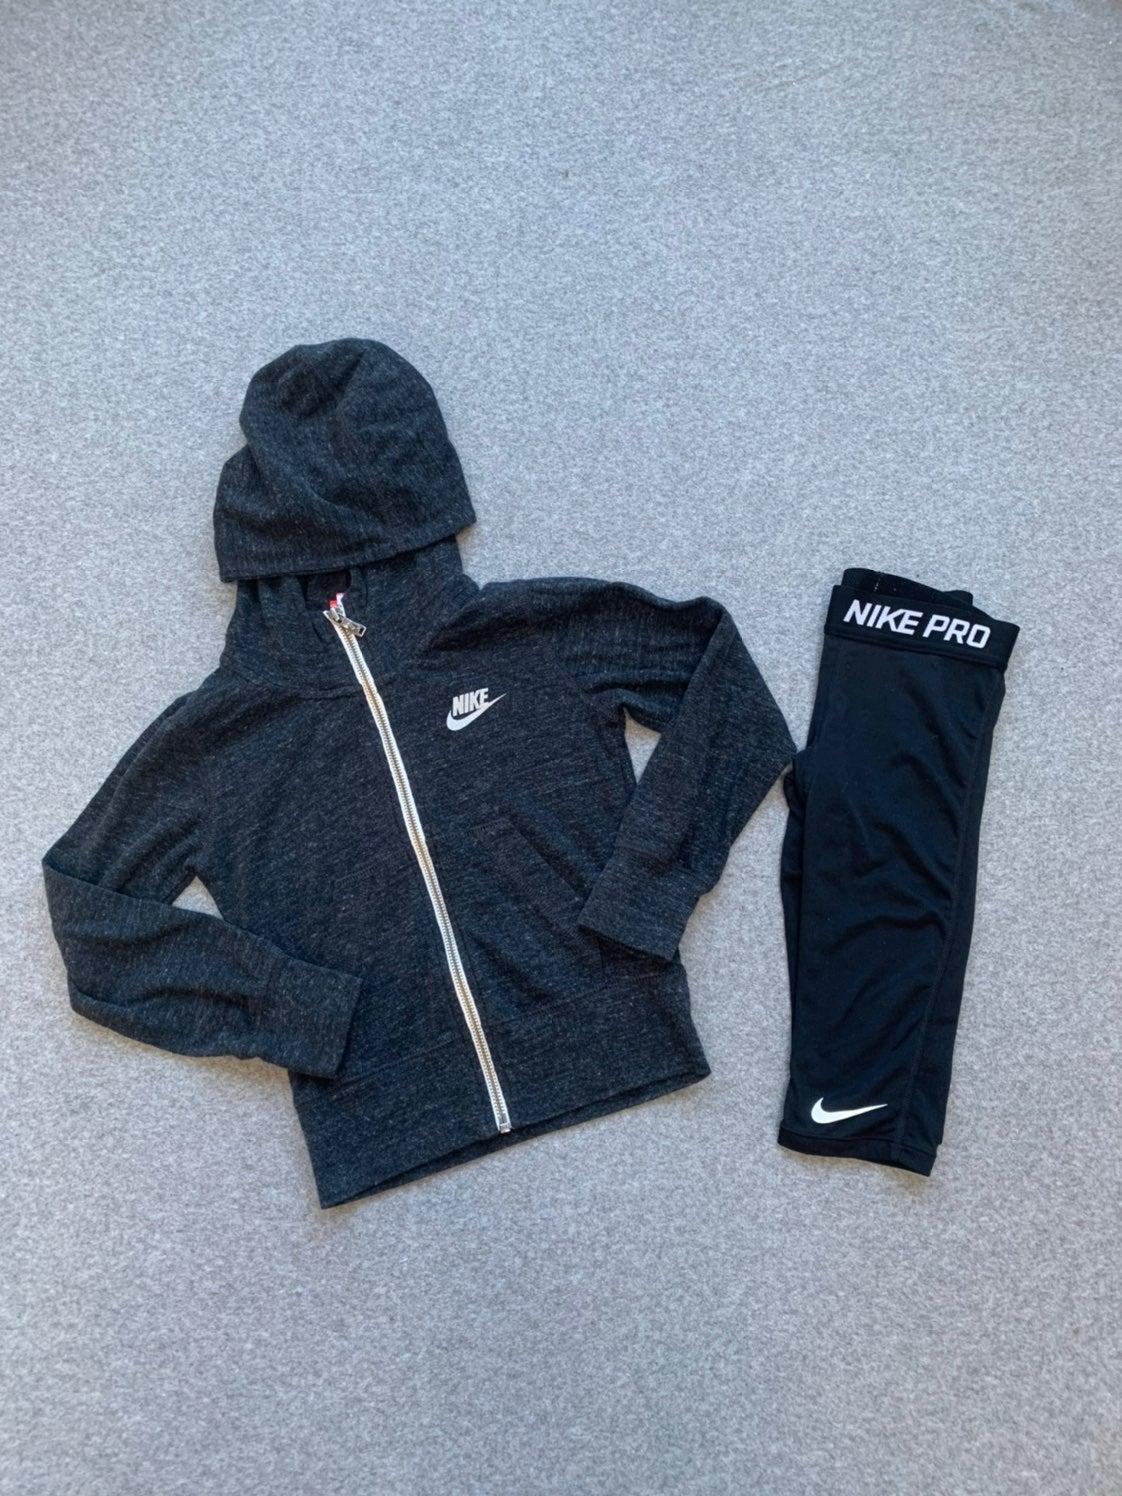 Youth Girls Nike Bundle